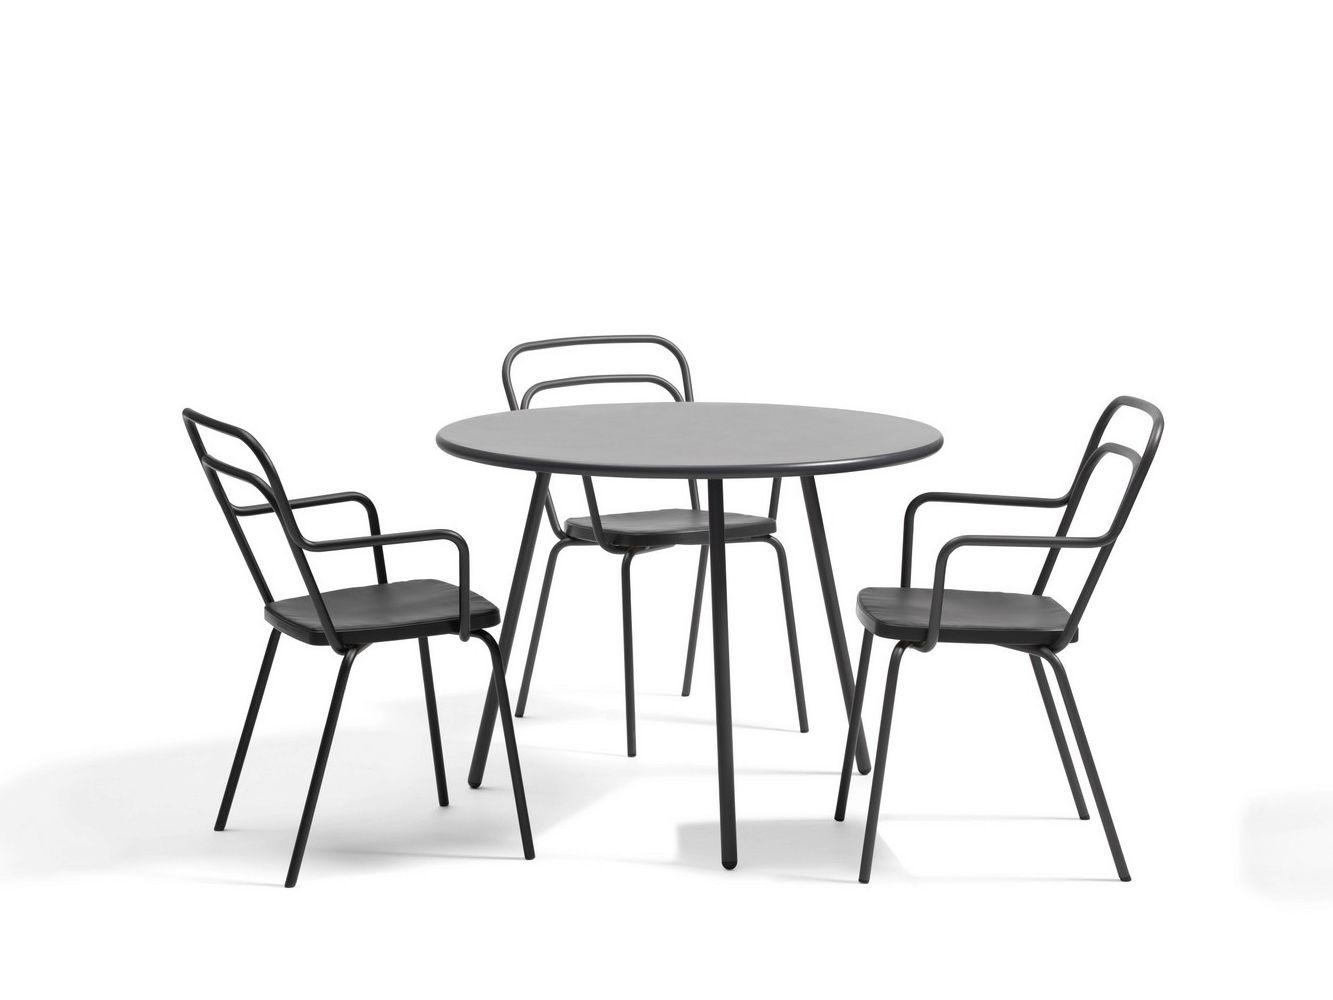 Kaffe tavolo da giardino rotondo by bl station design thomas bernstrand - Tavolo rotondo da giardino ...